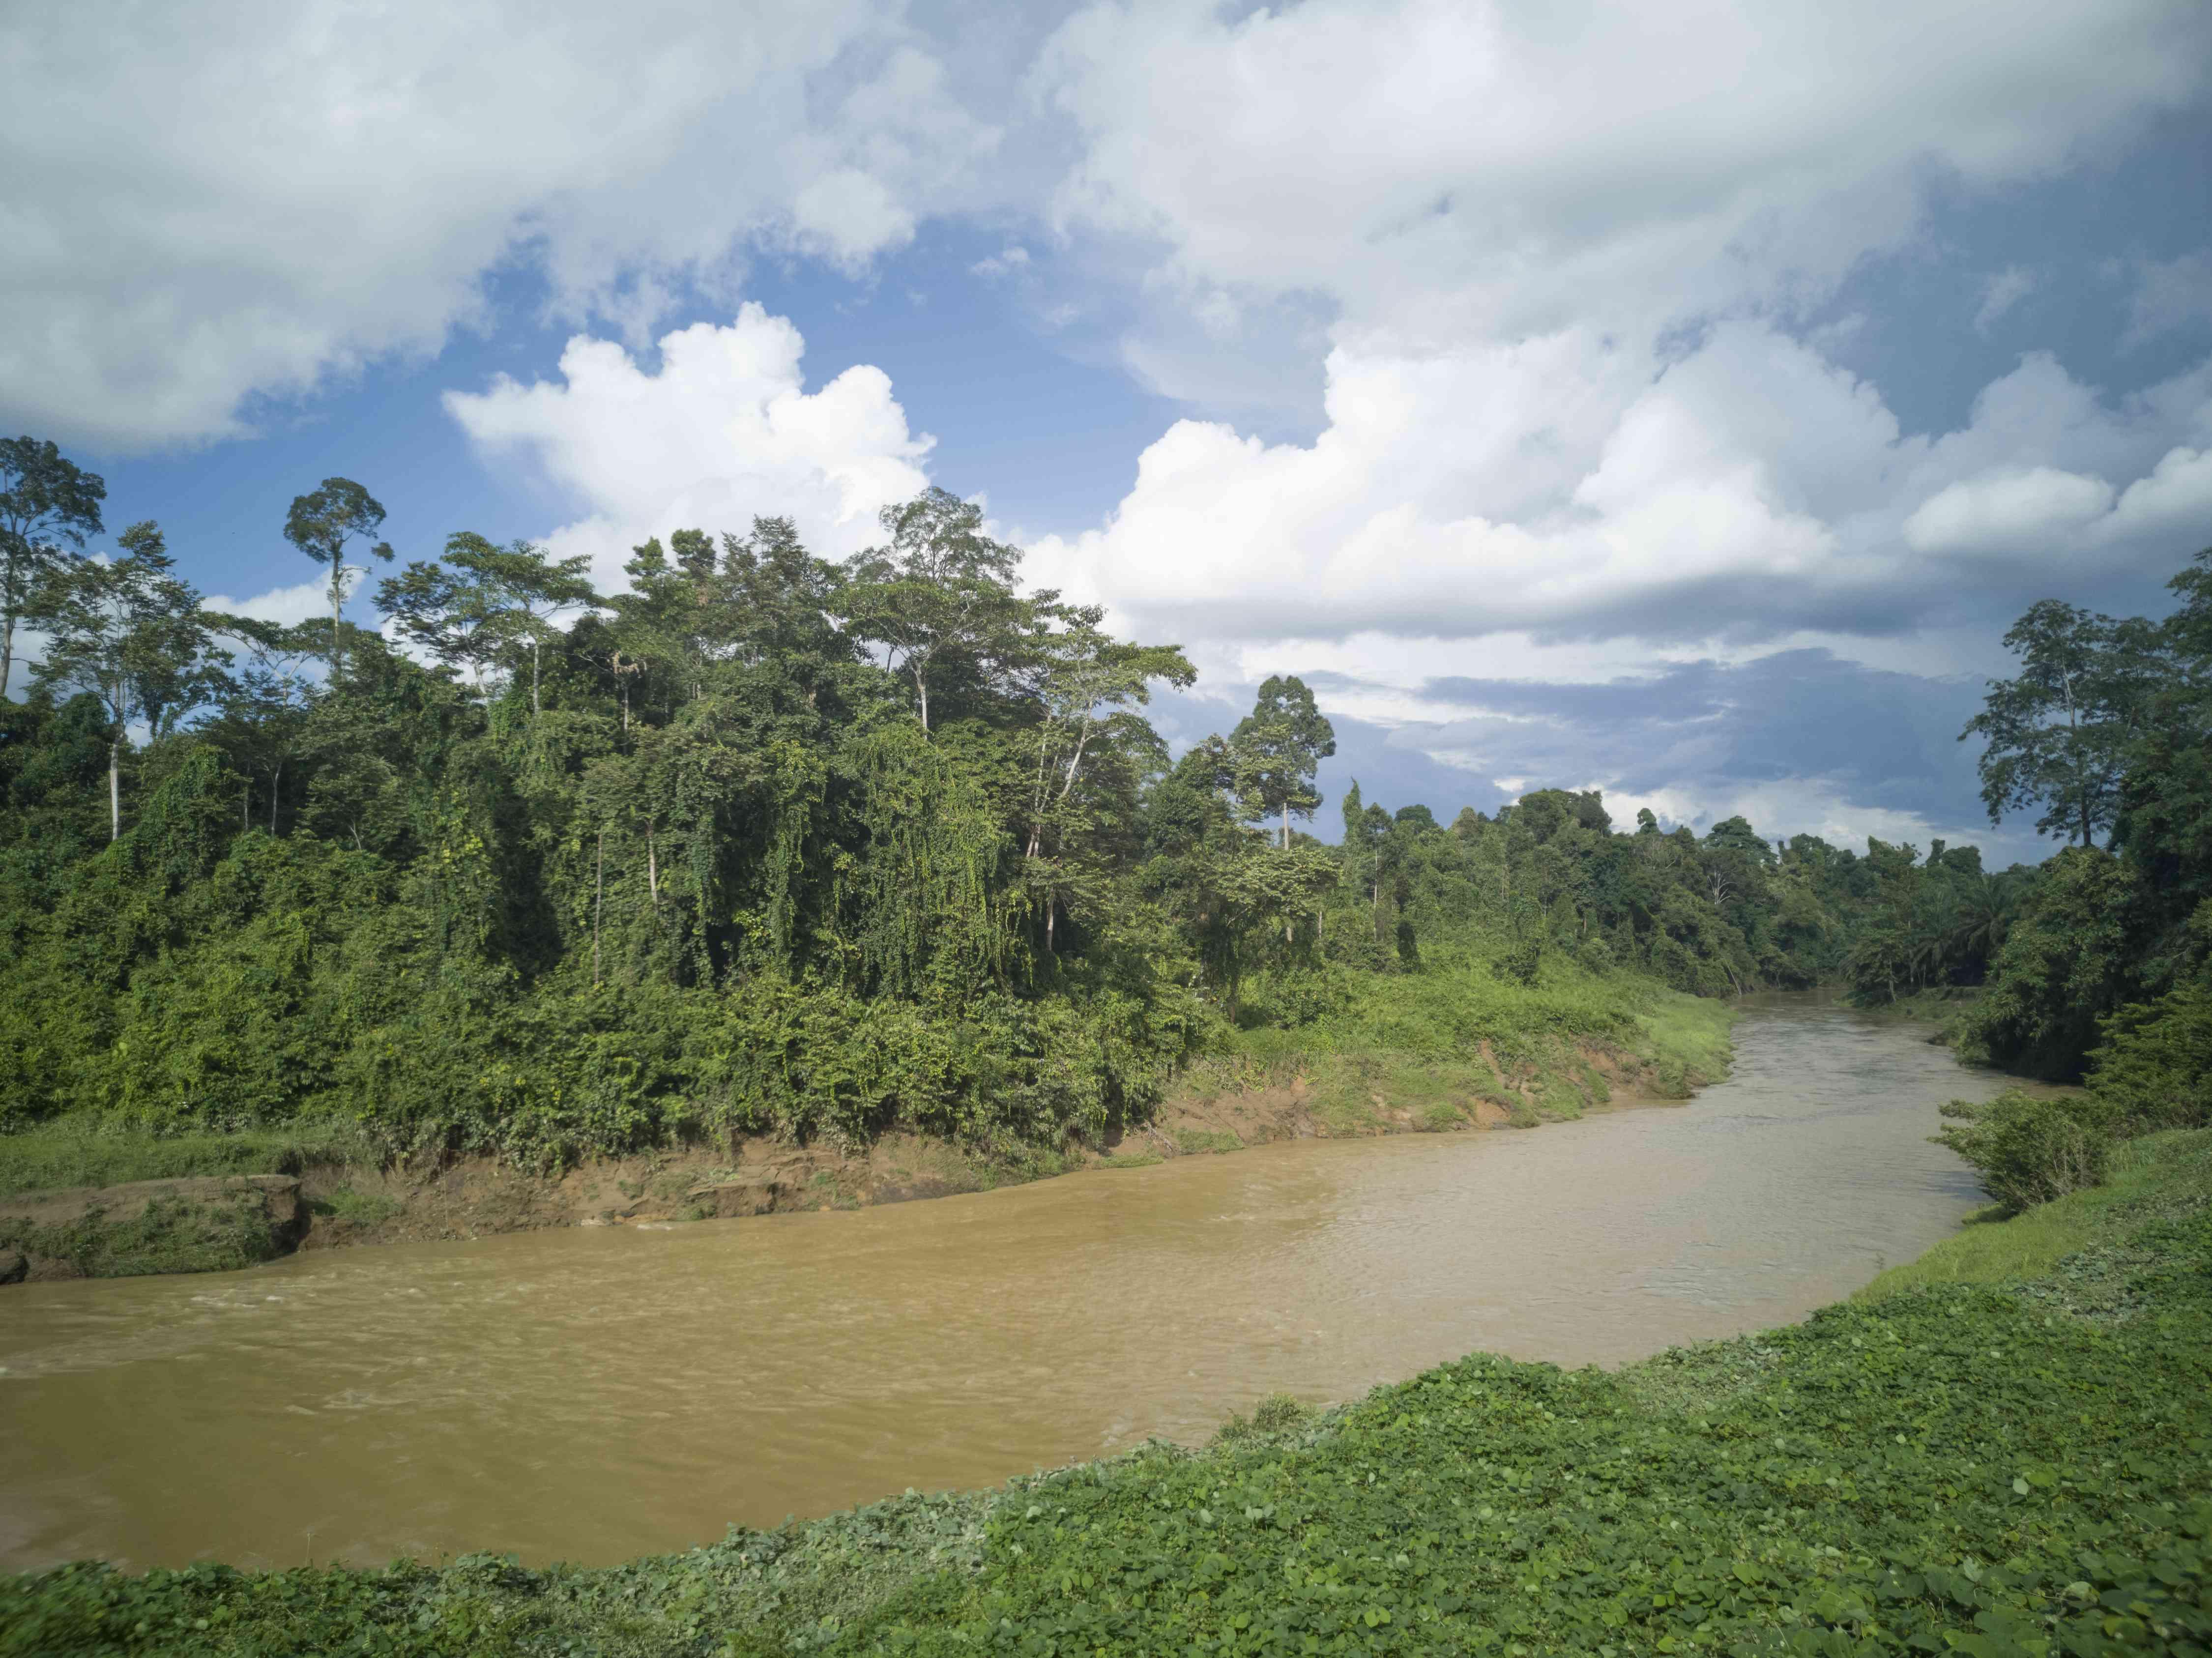 Muddy river at Tawau Hills National Park in Sabah, Borneo